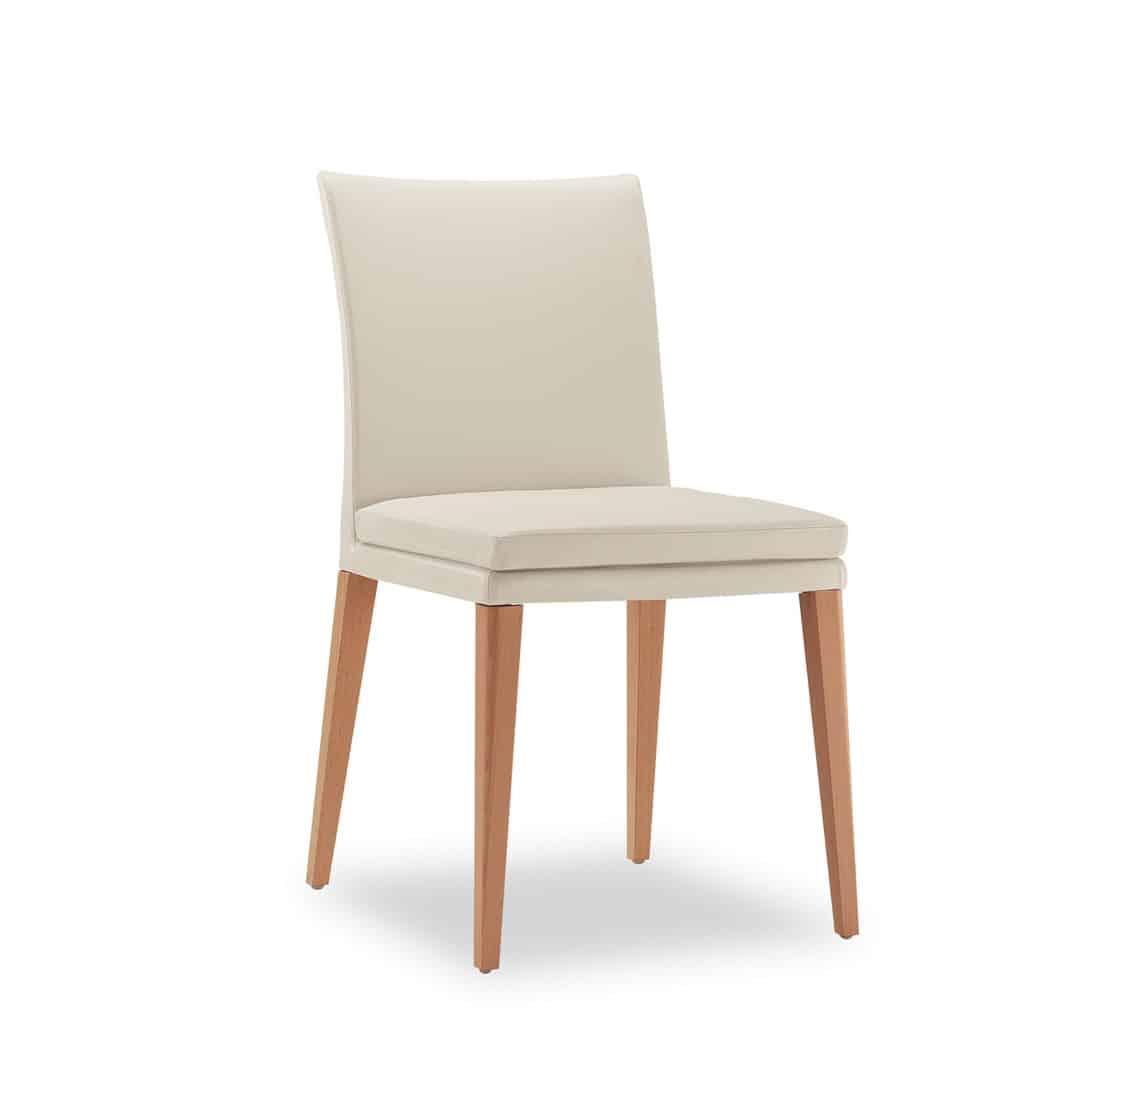 Bond Side Chair Ensemble DeFrae Contract Furniture Tonon